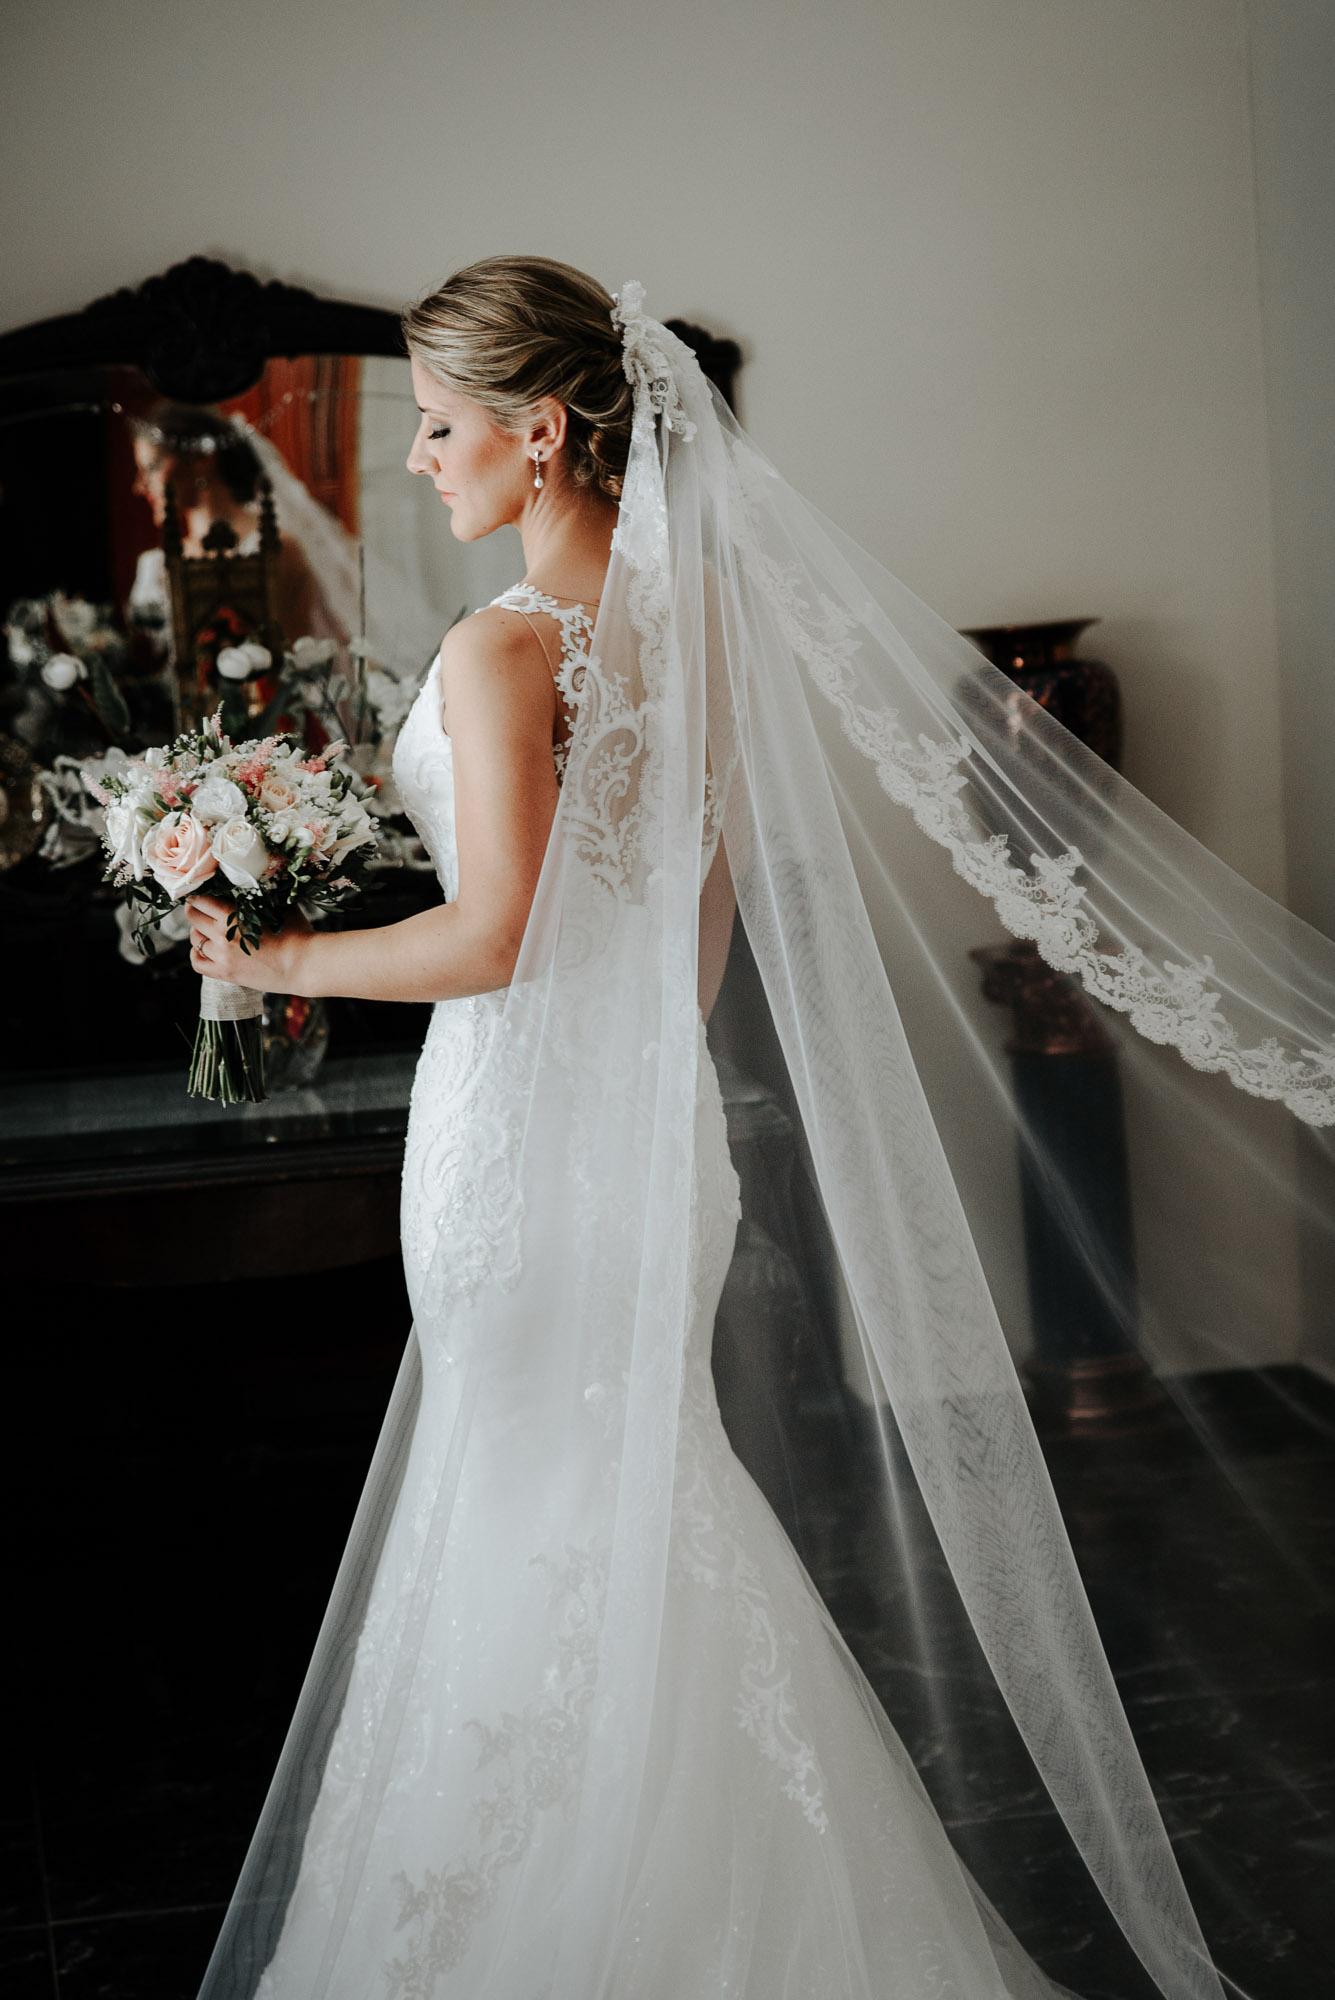 Fotógrafo de bodas de alta calidad